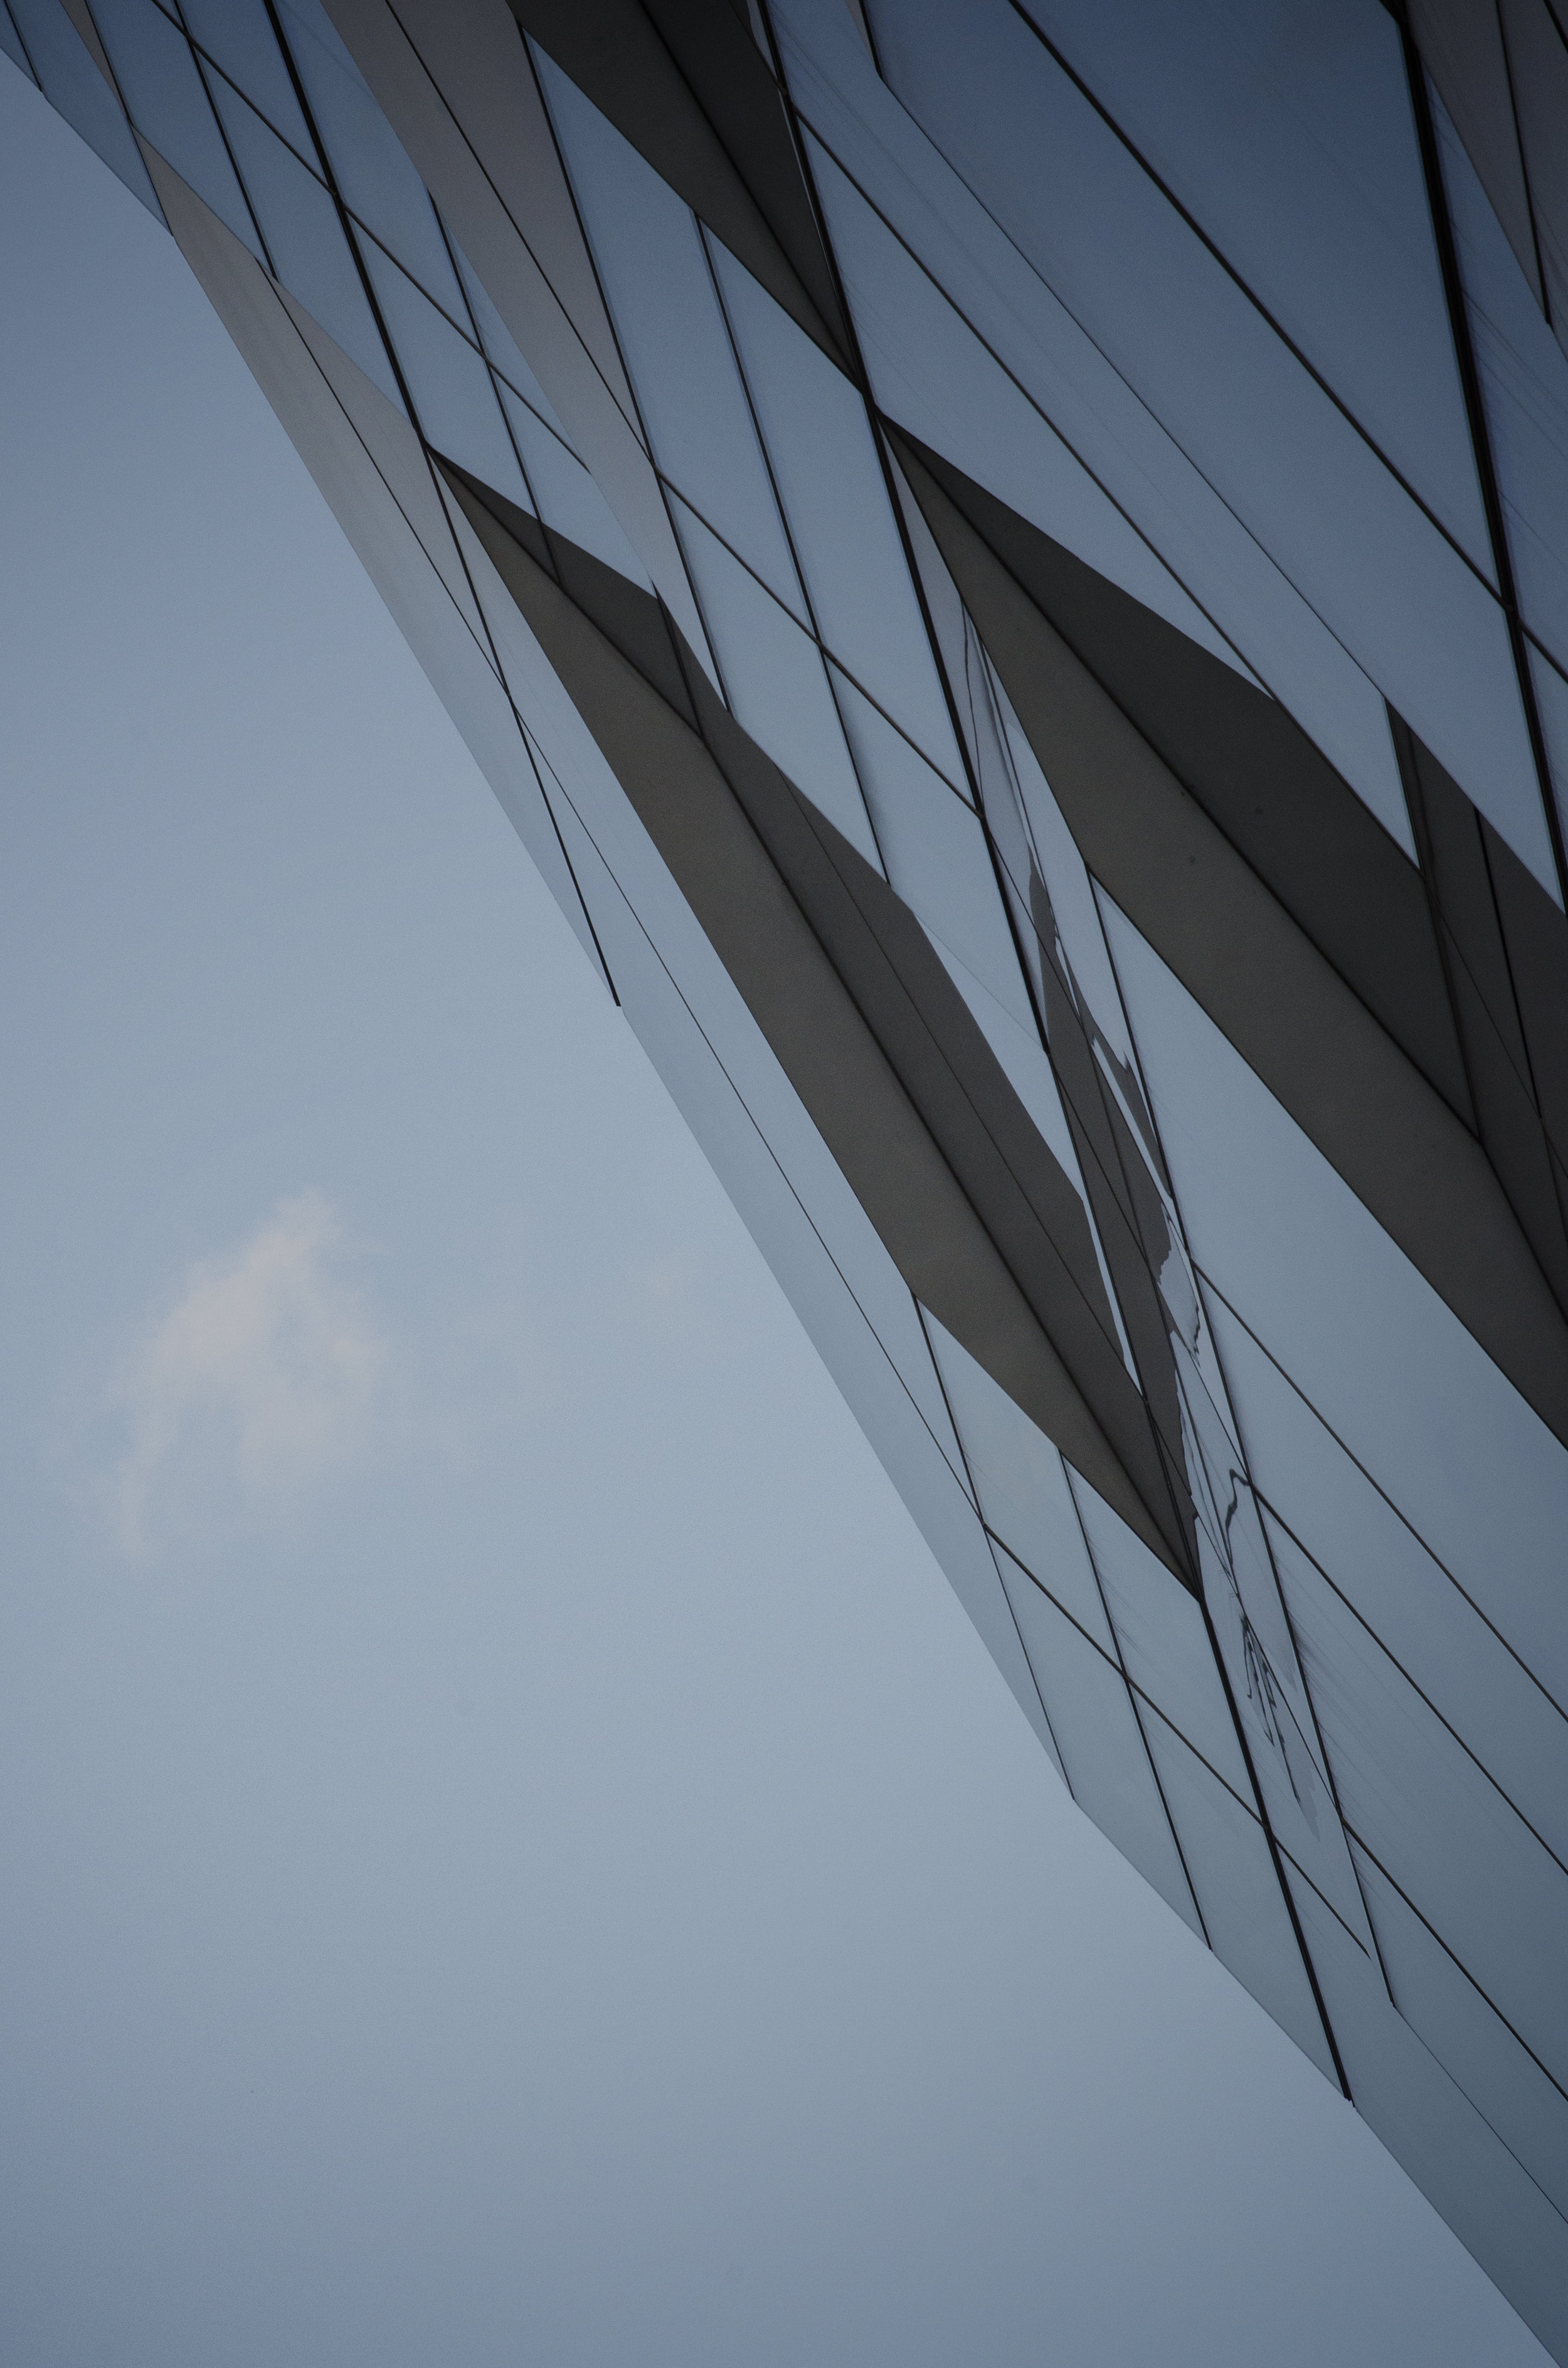 sky-angles_38680502302_o.jpg